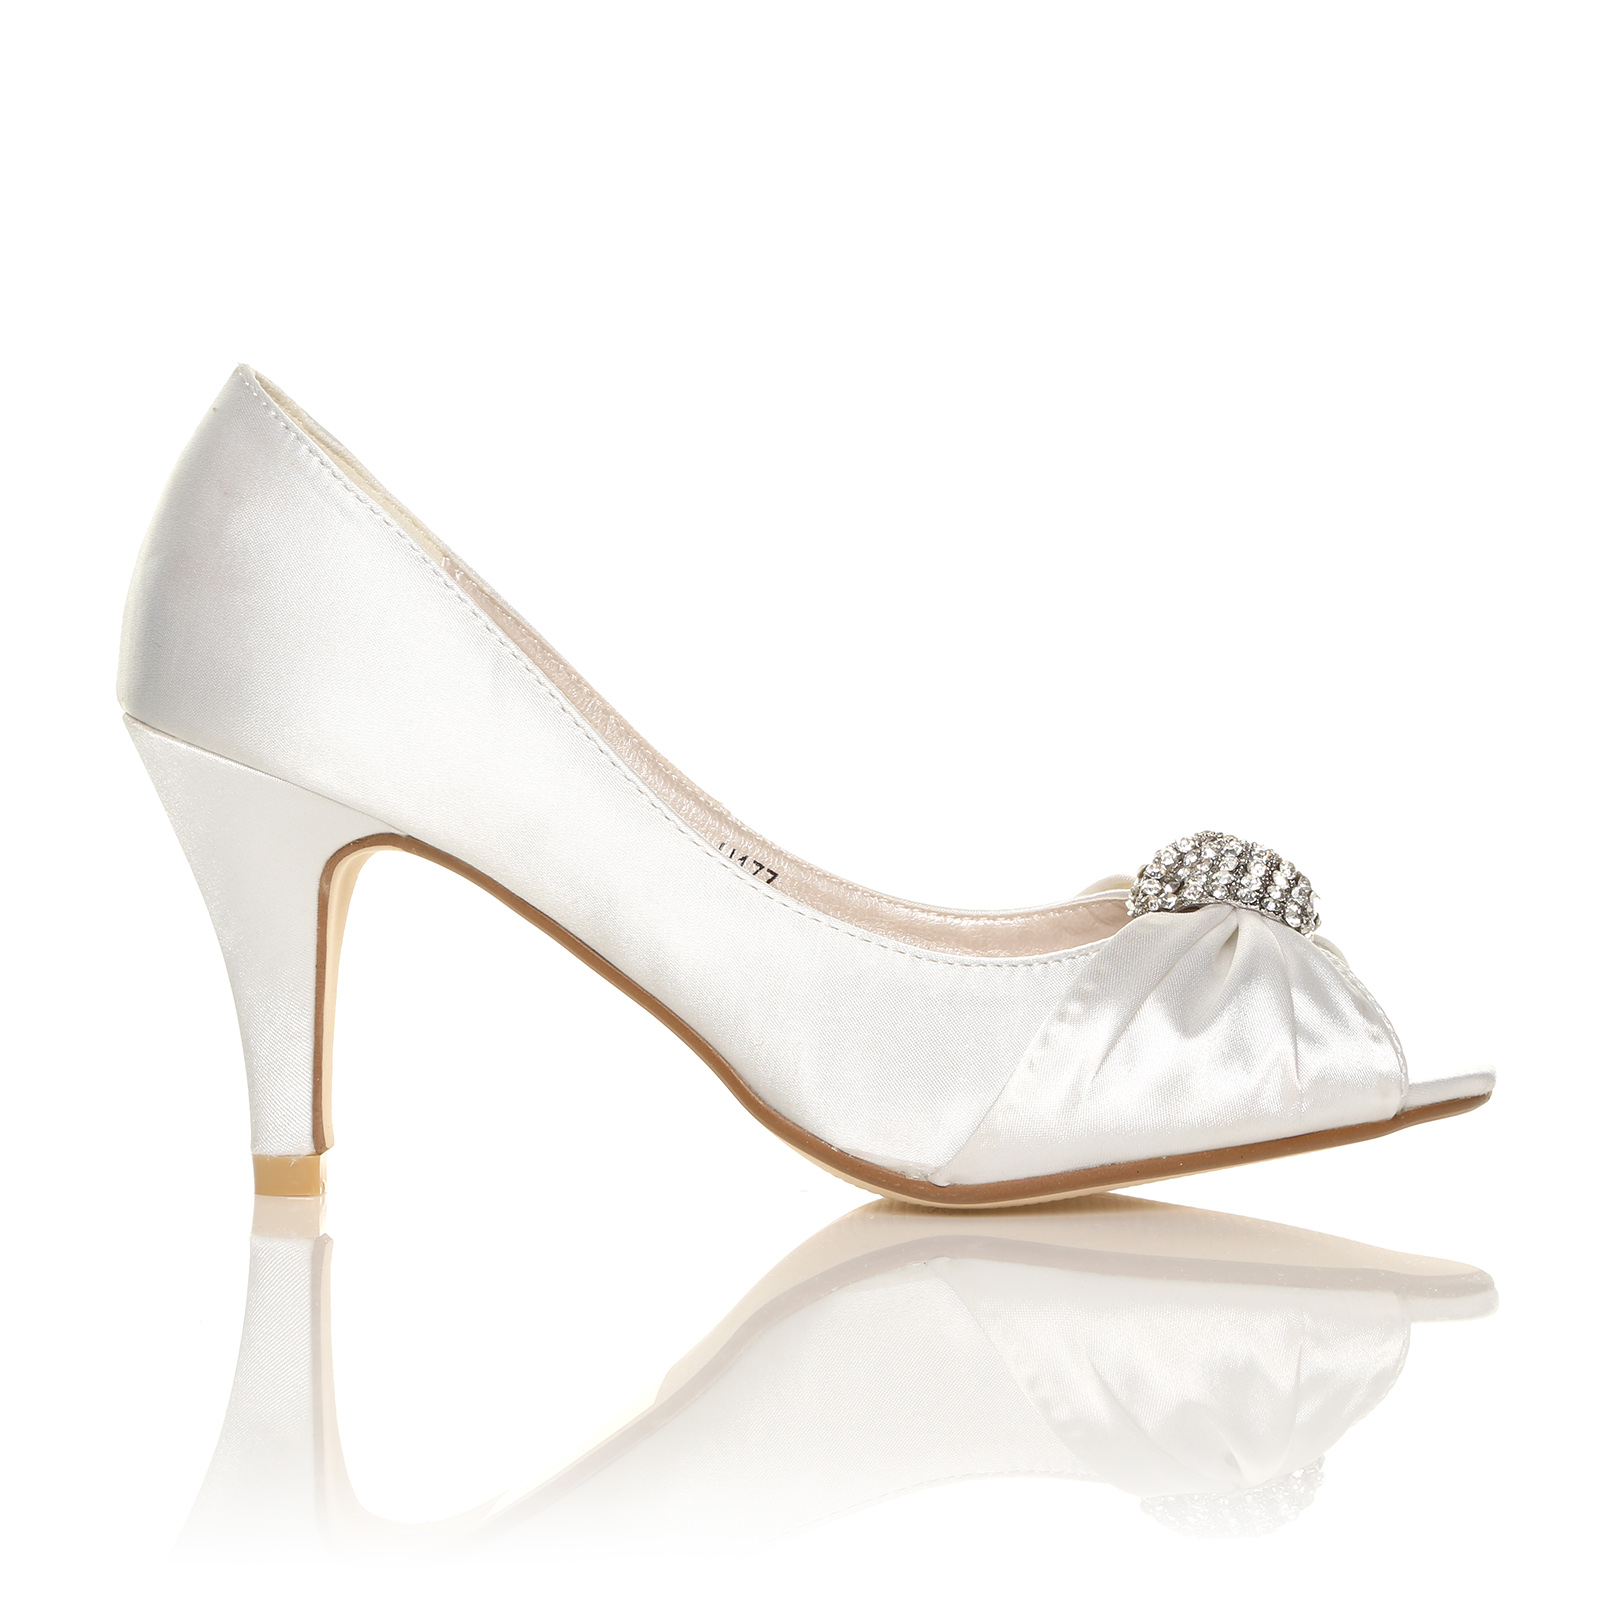 ivory white satin low heel bridal prom